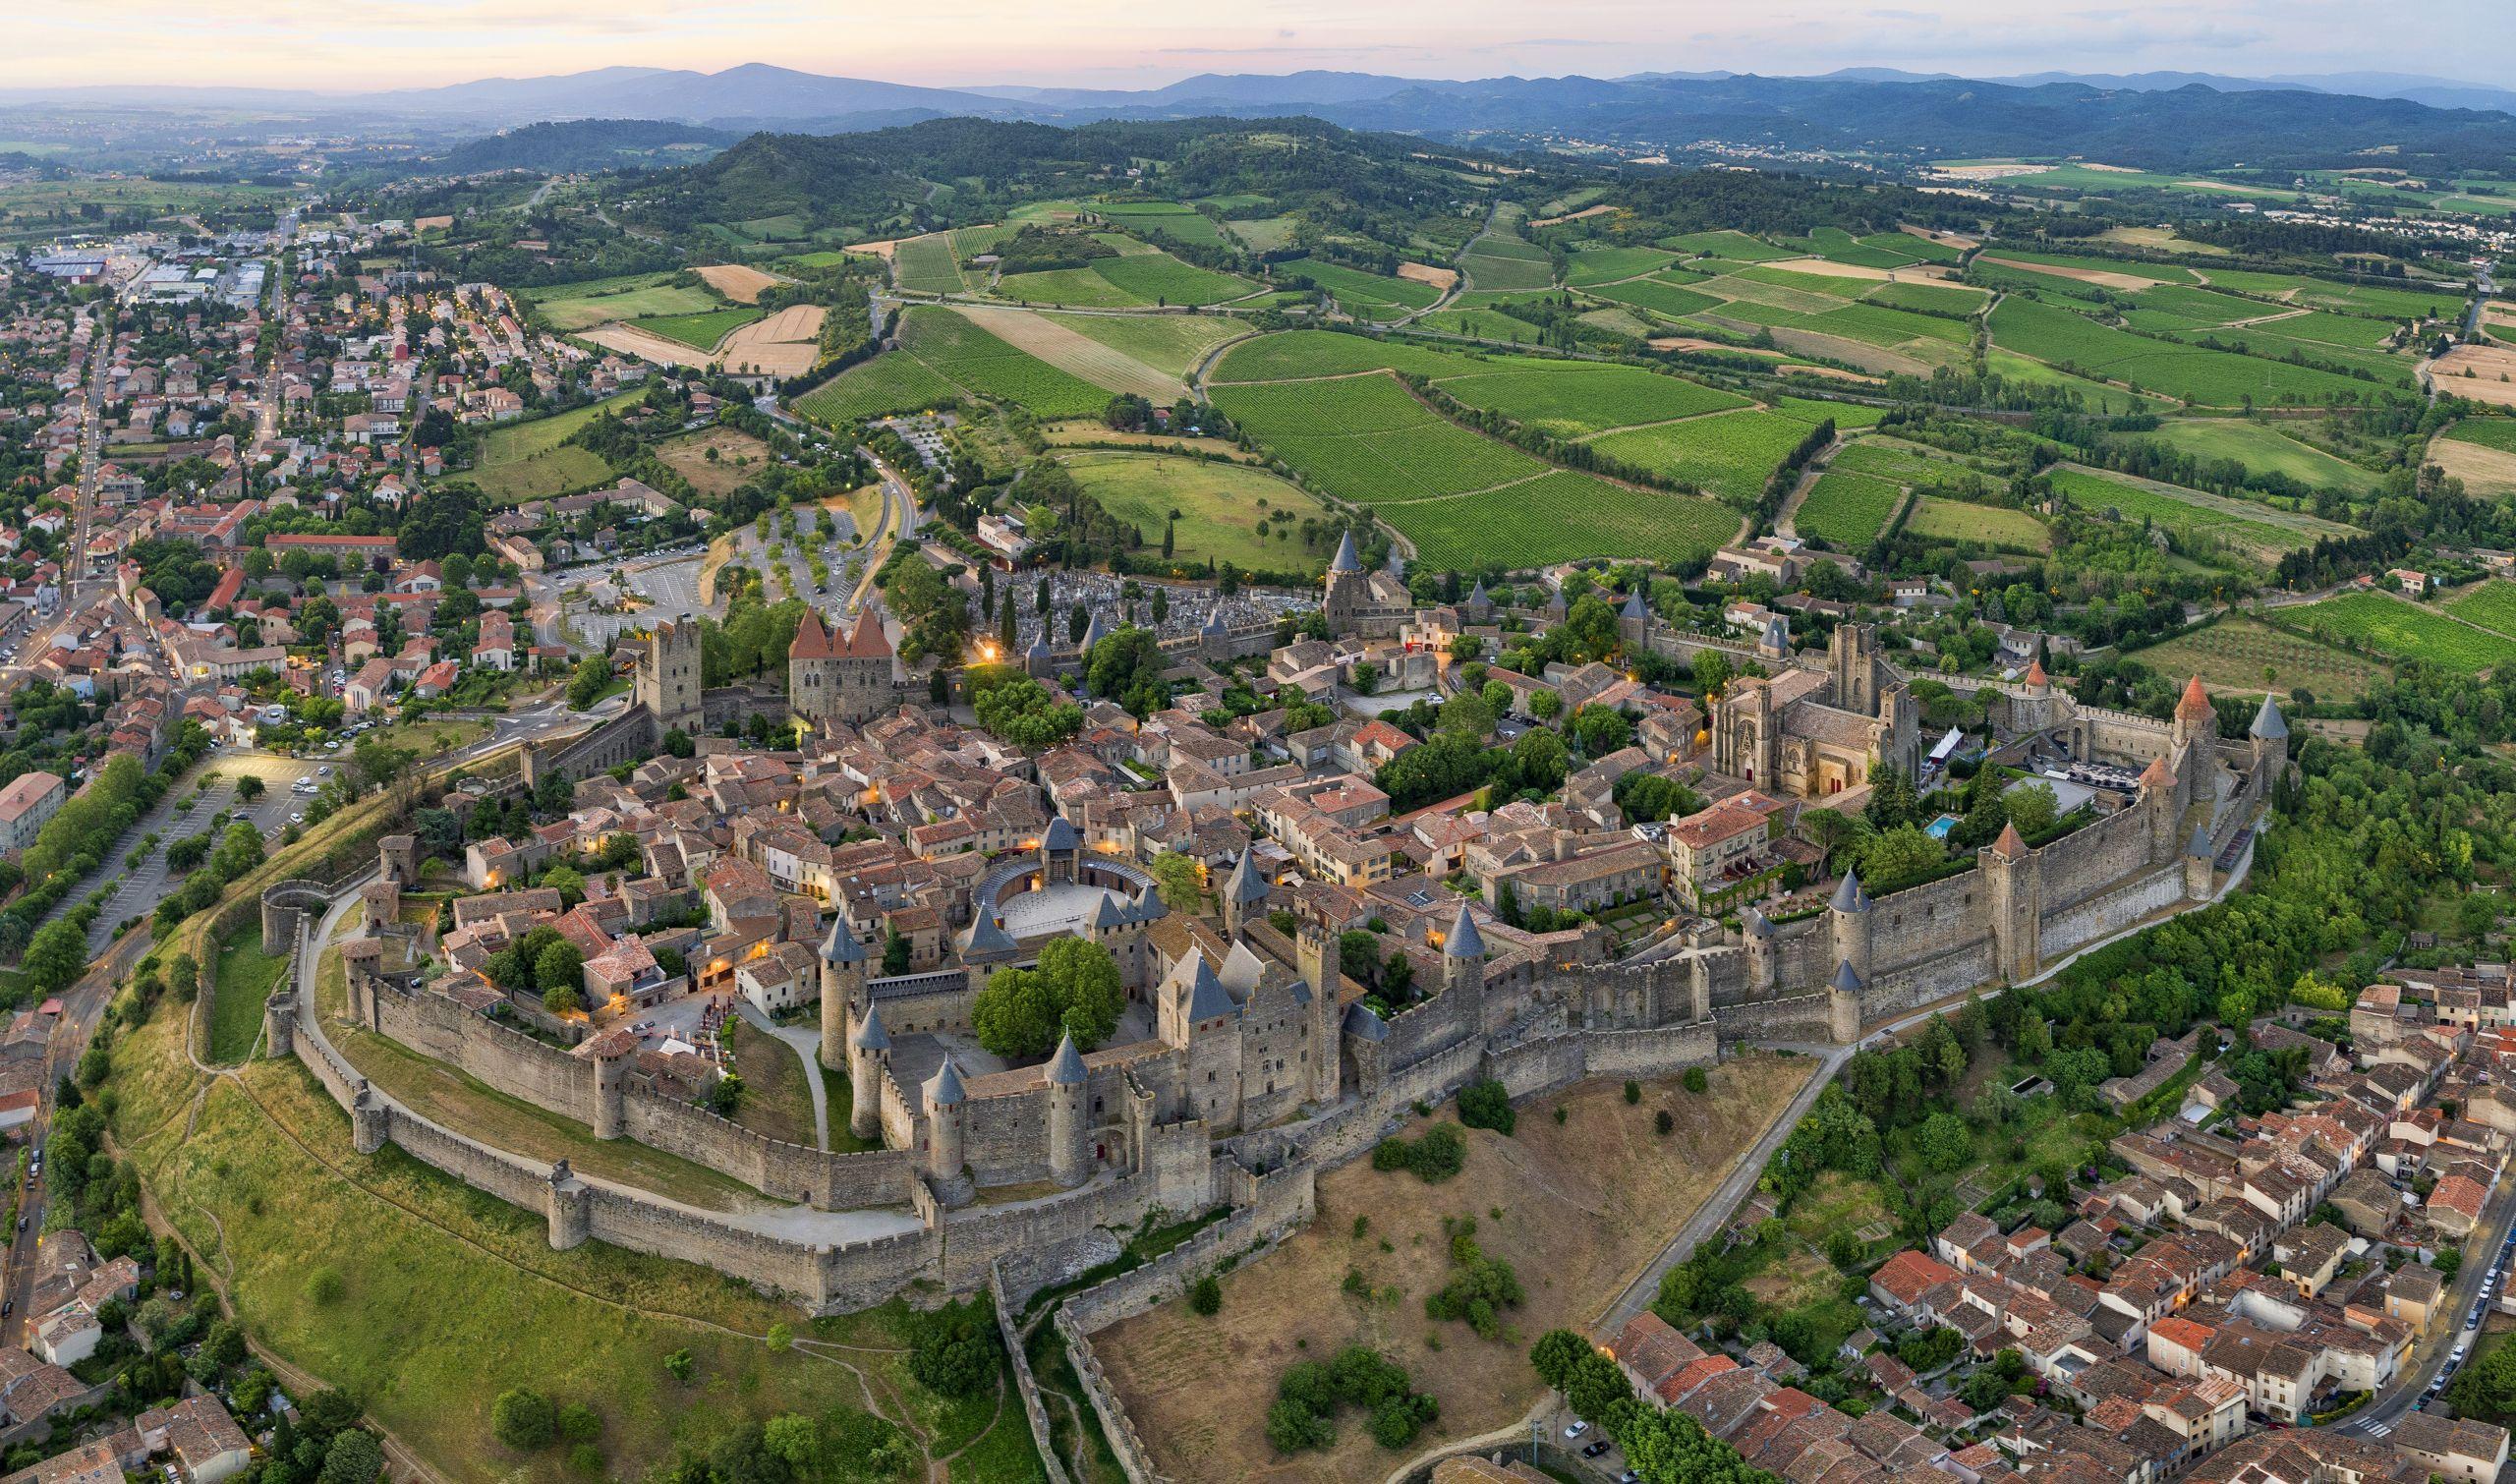 1 carcassonne aerial 2016